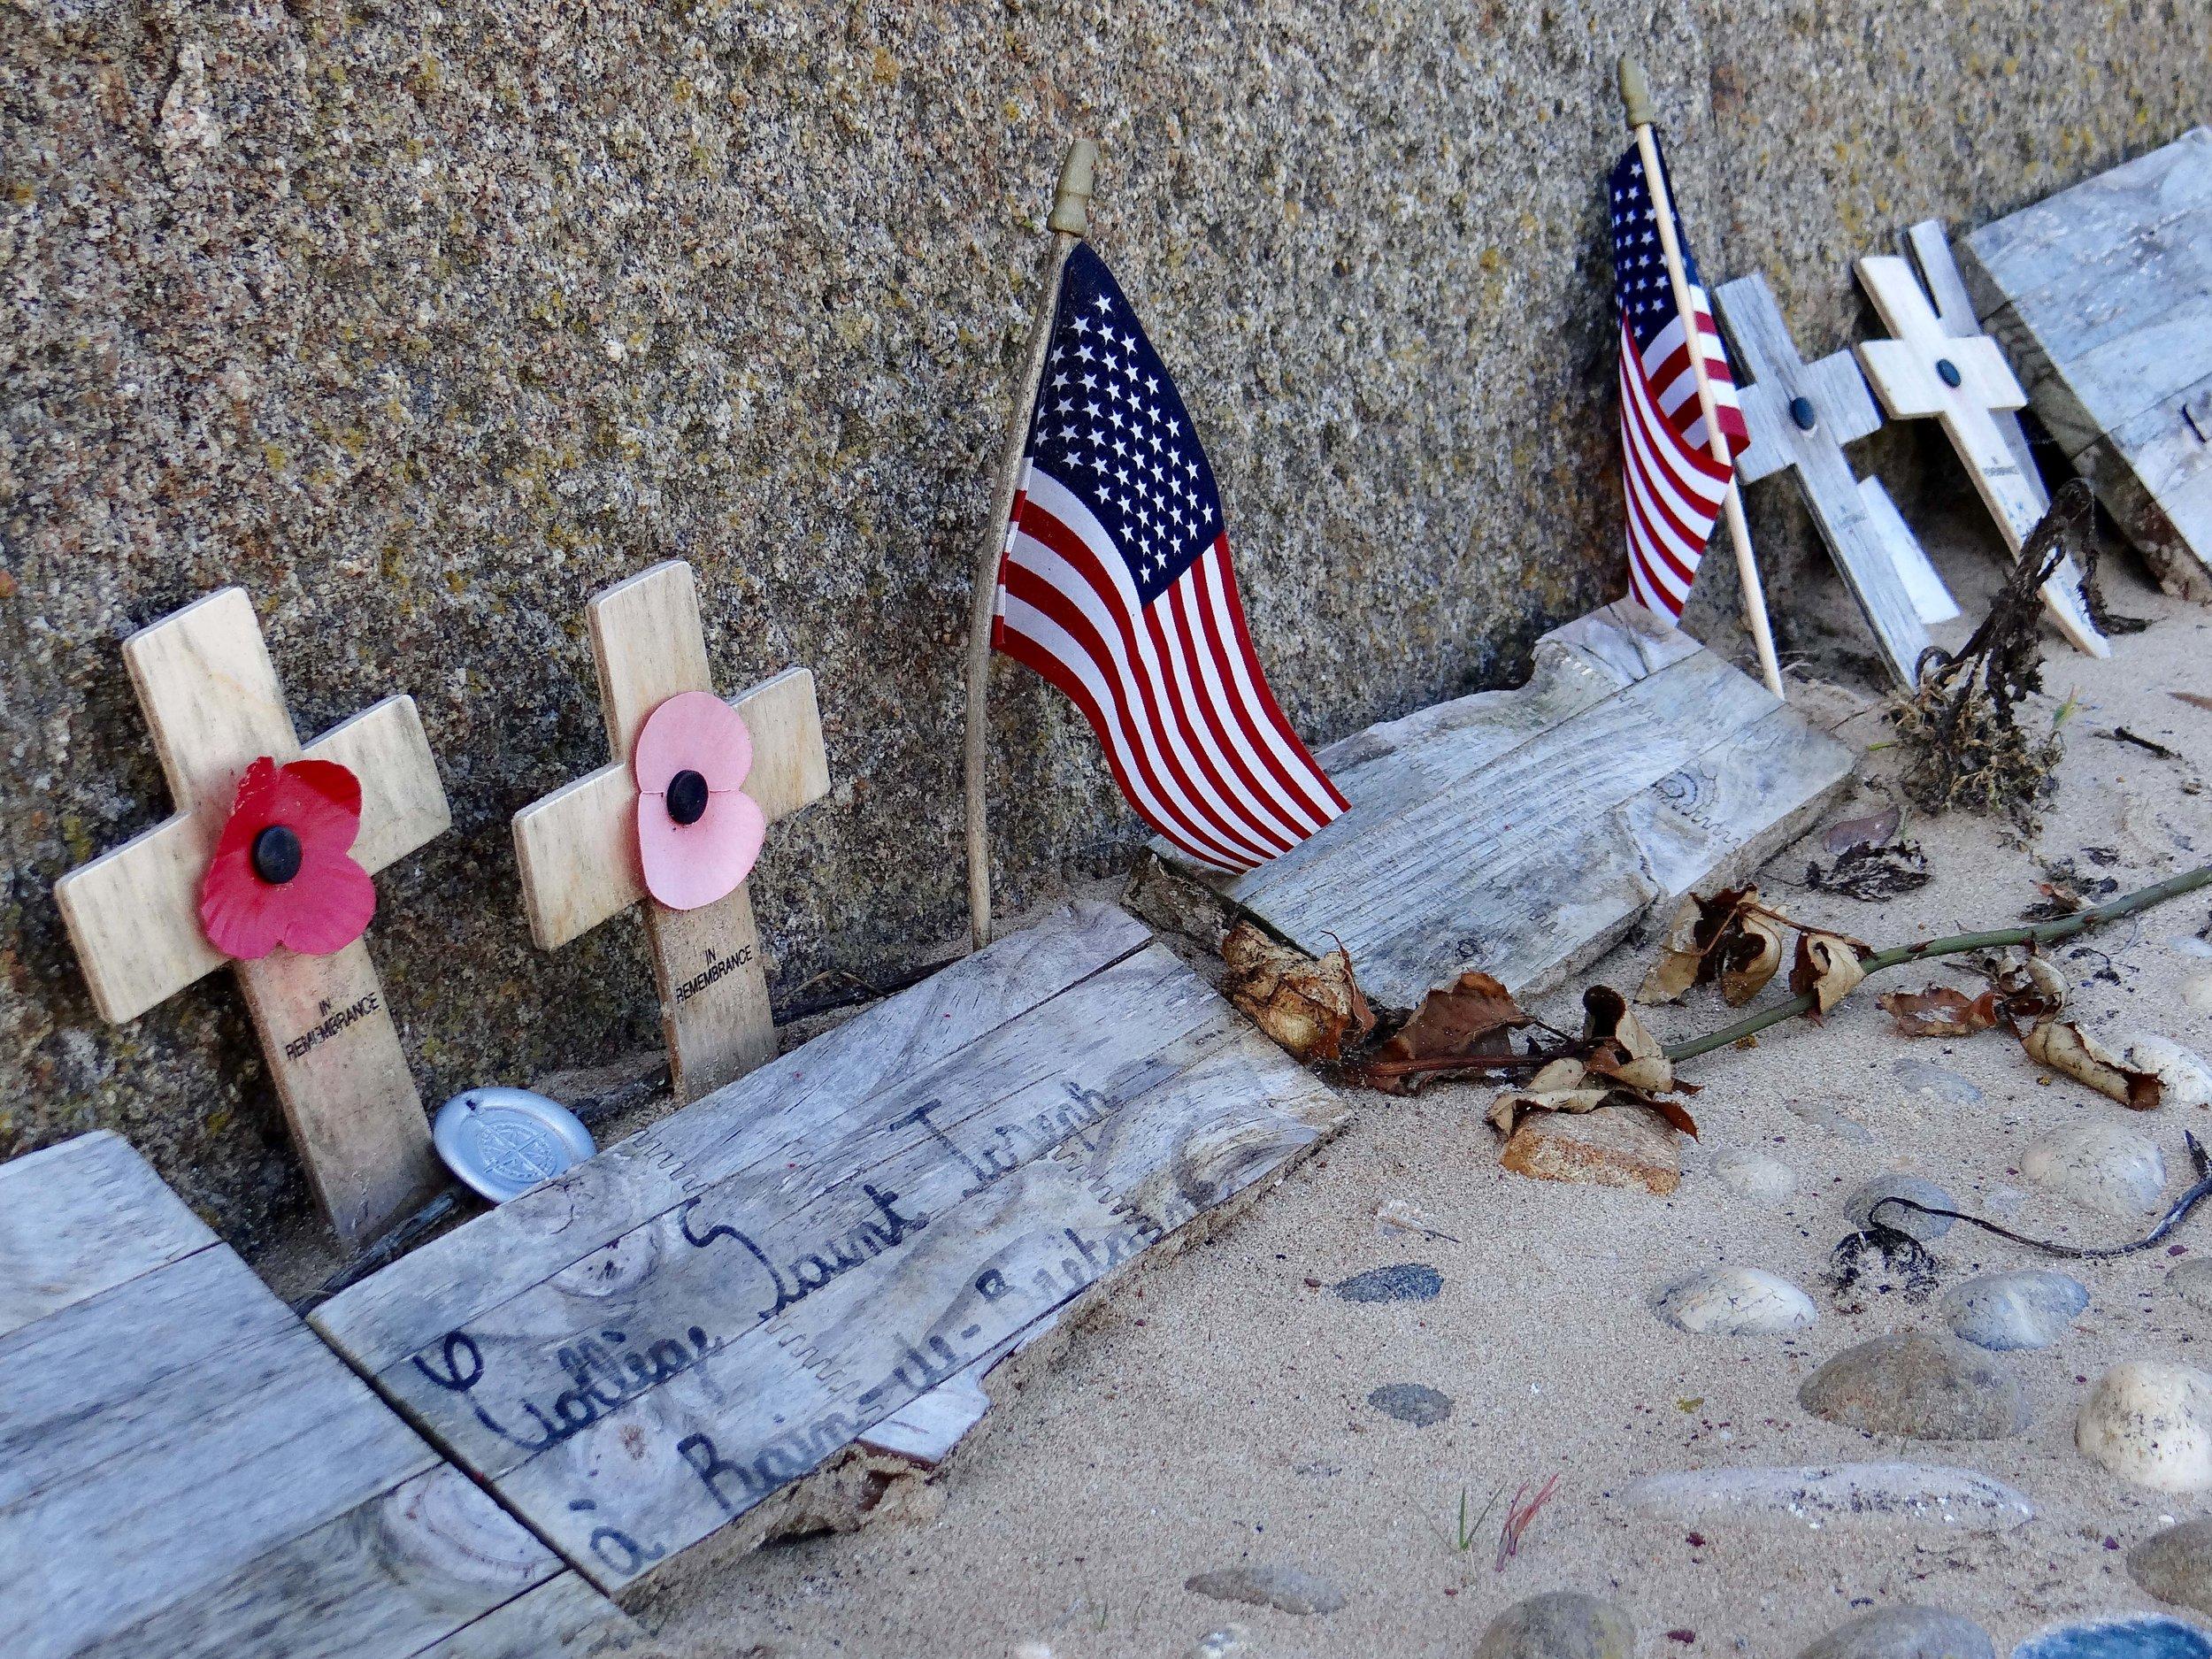 Memorial Omaha Beach, Normandy, France